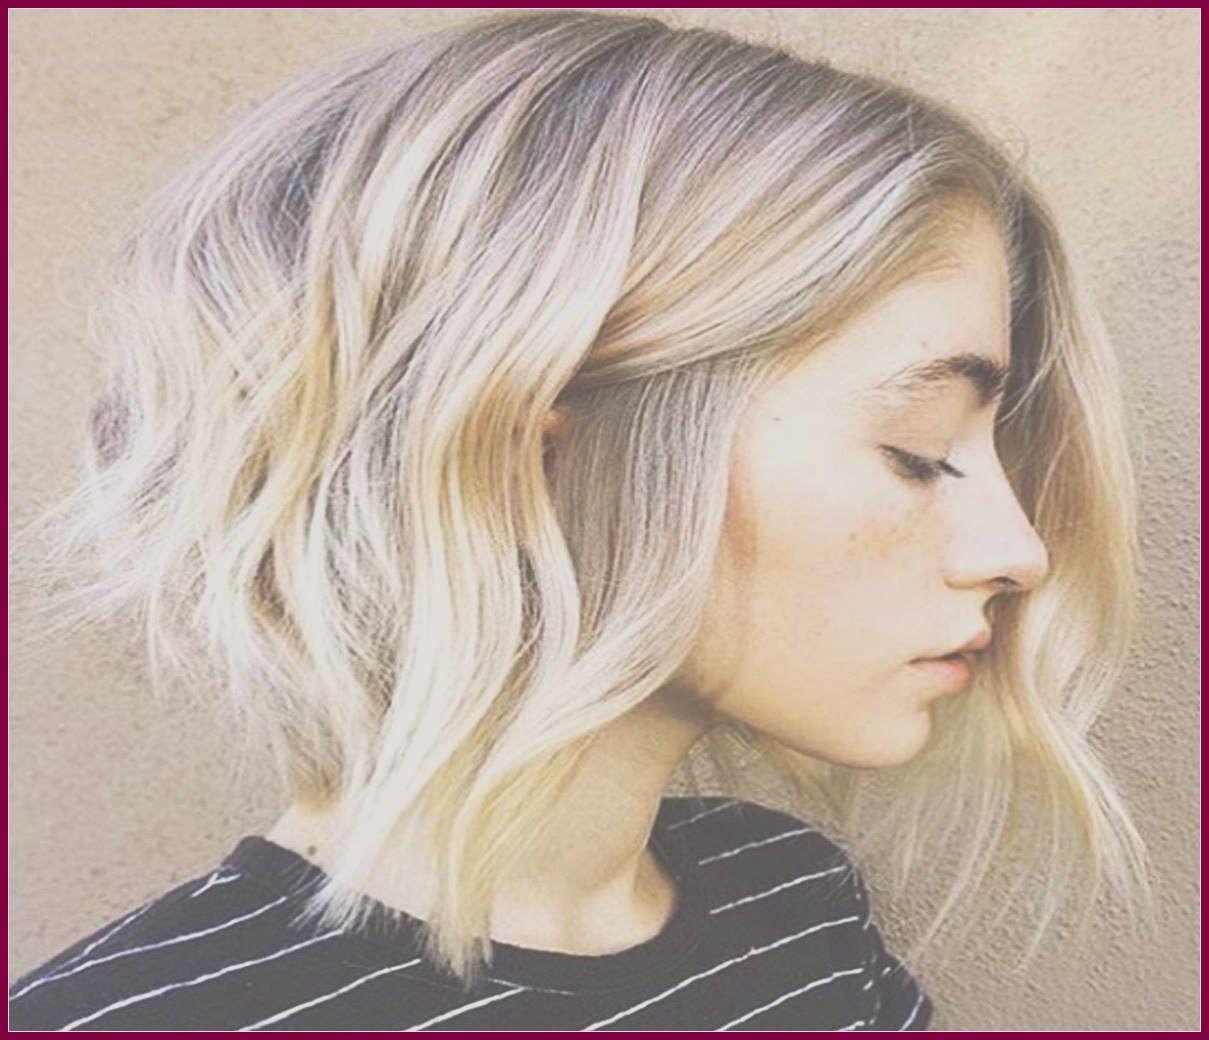 Coole Frisuren Frauen Die Besten Kurze Haare Looks Bilder